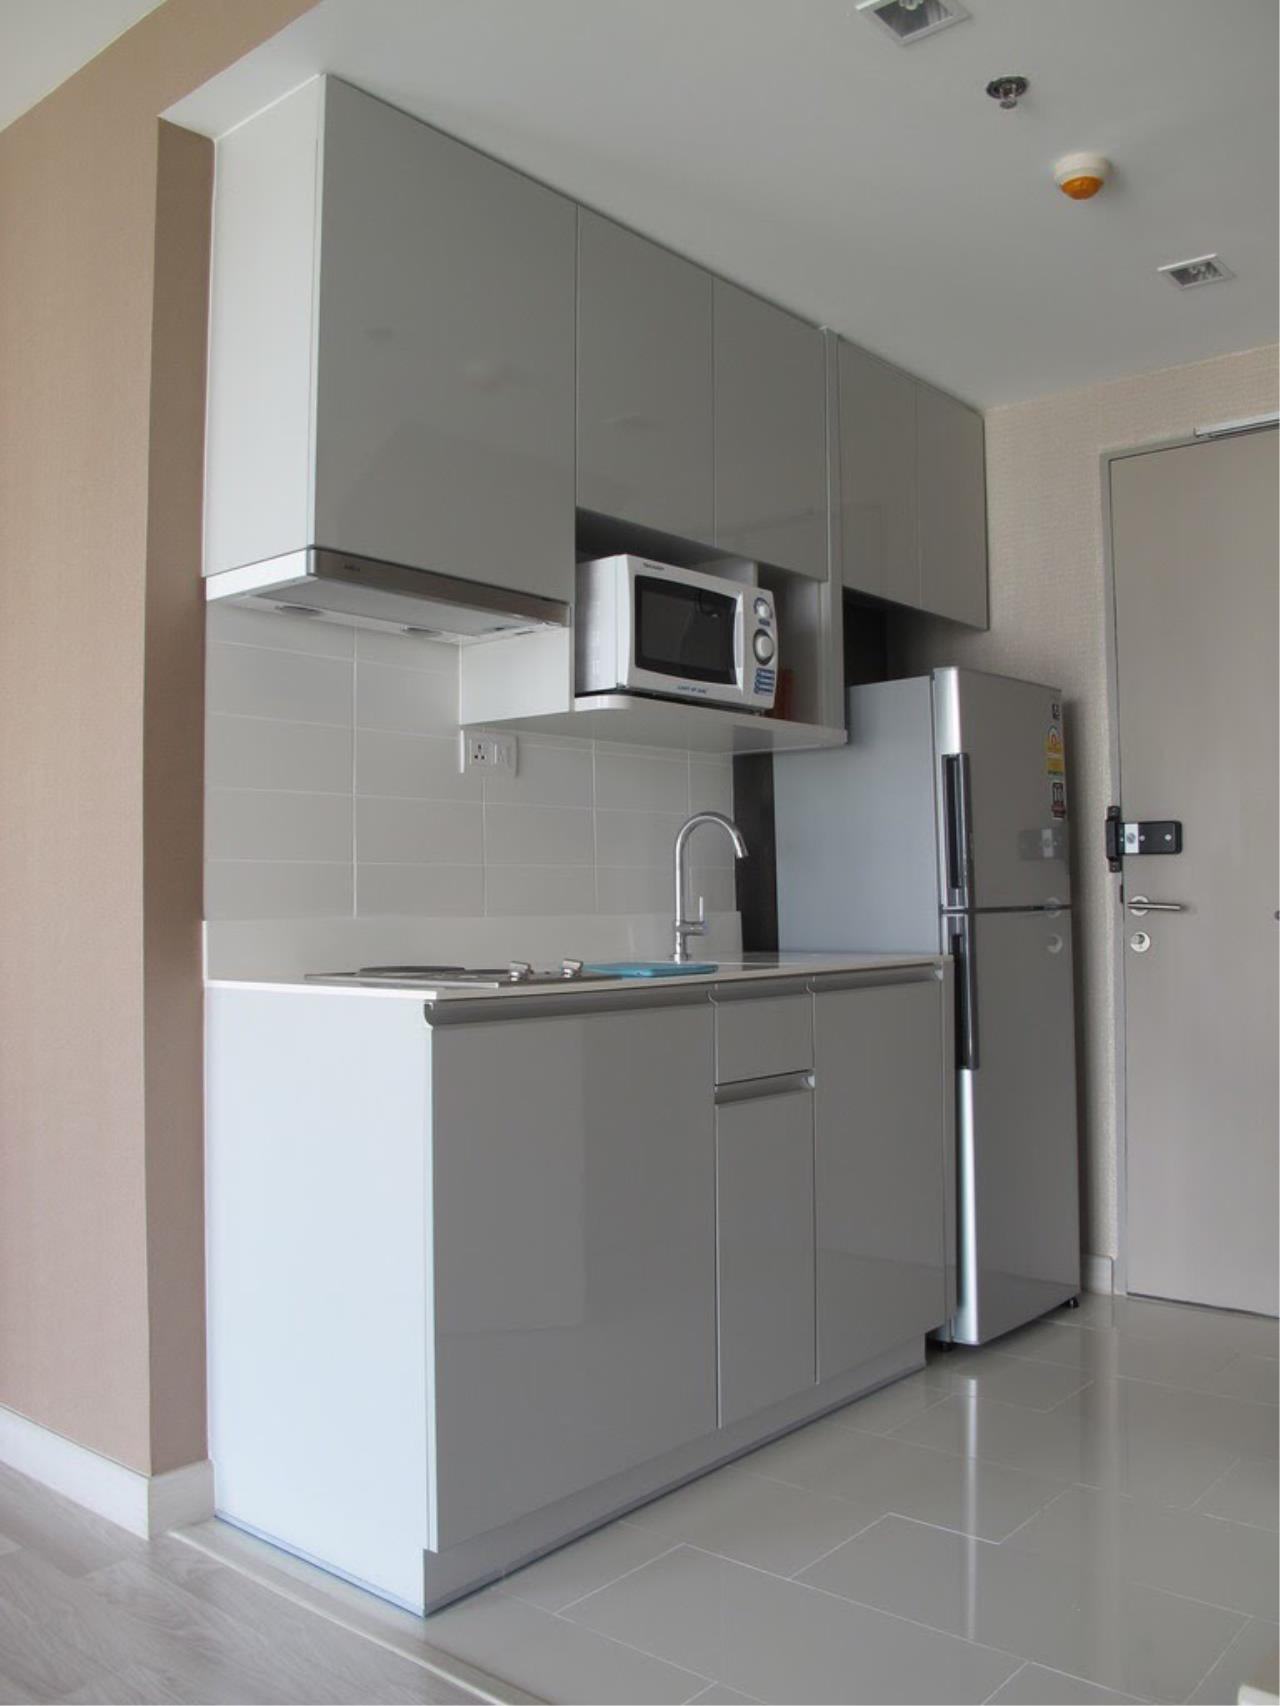 Quality Life Property Agency's Ideo Mobi Sukhumvit Onnut (SALE & RENT) 2